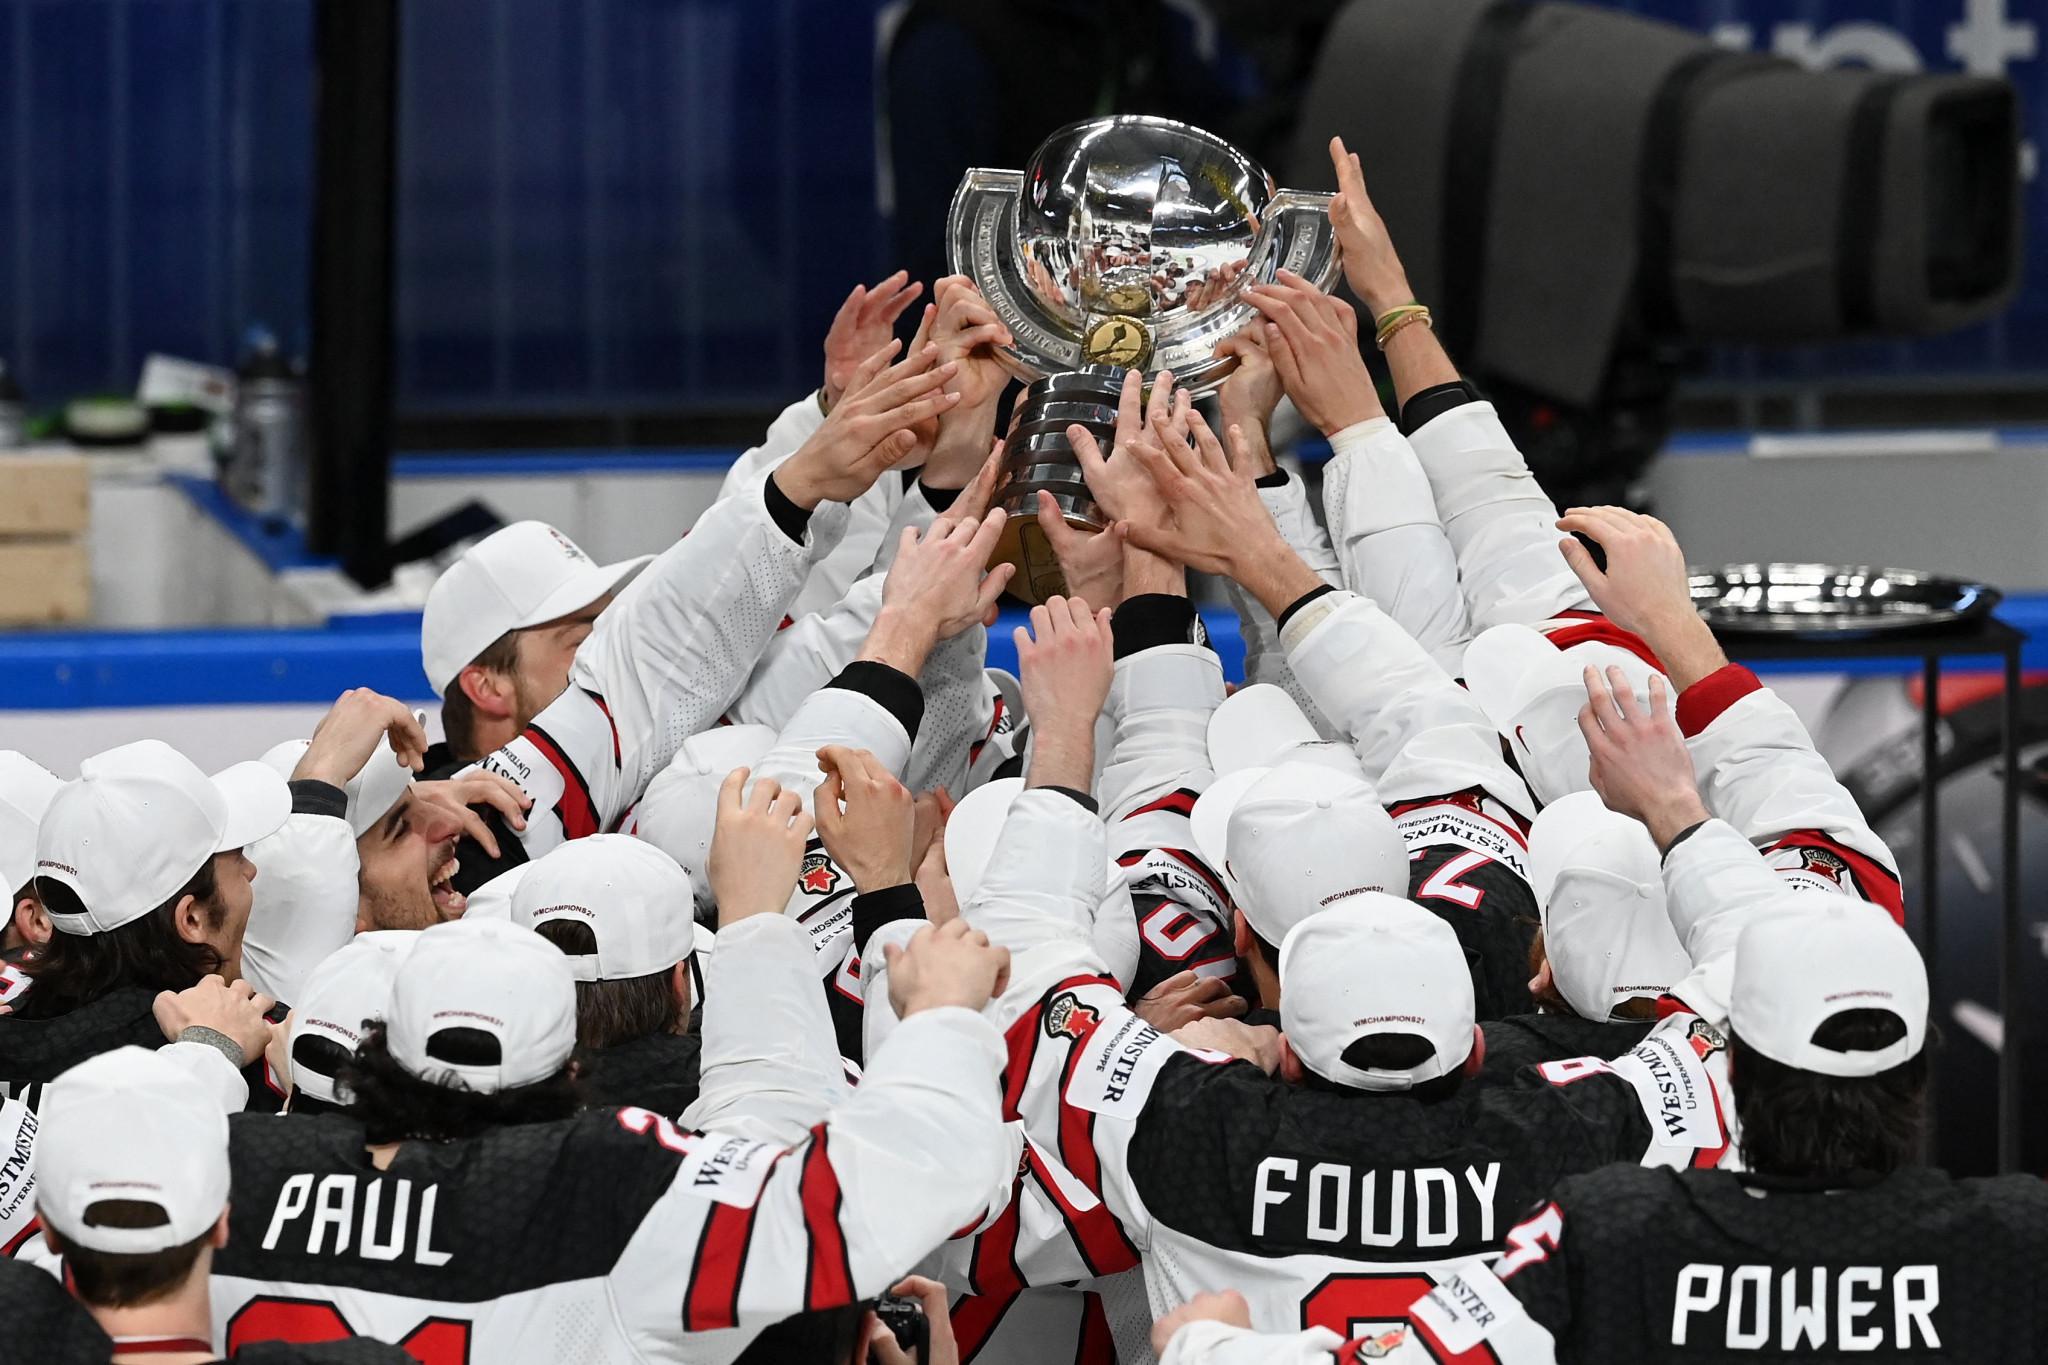 Groups announced for 2022 IIHF Ice Hockey World Championship